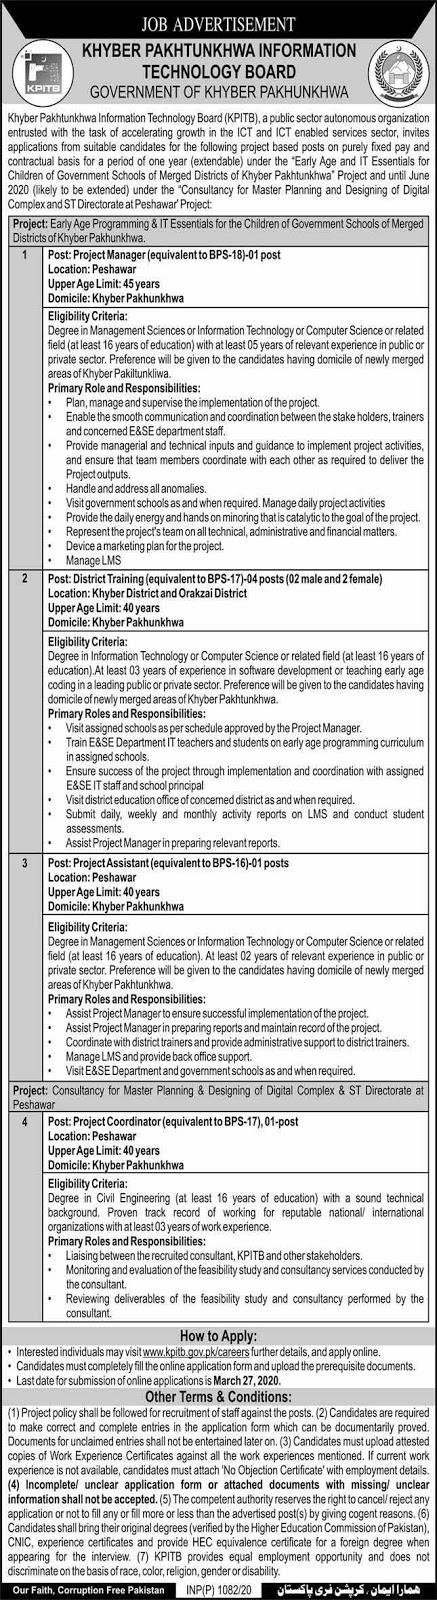 Latest Jobs in Khyber Pakhtunkhwa Information Technology Board 12-03-2020